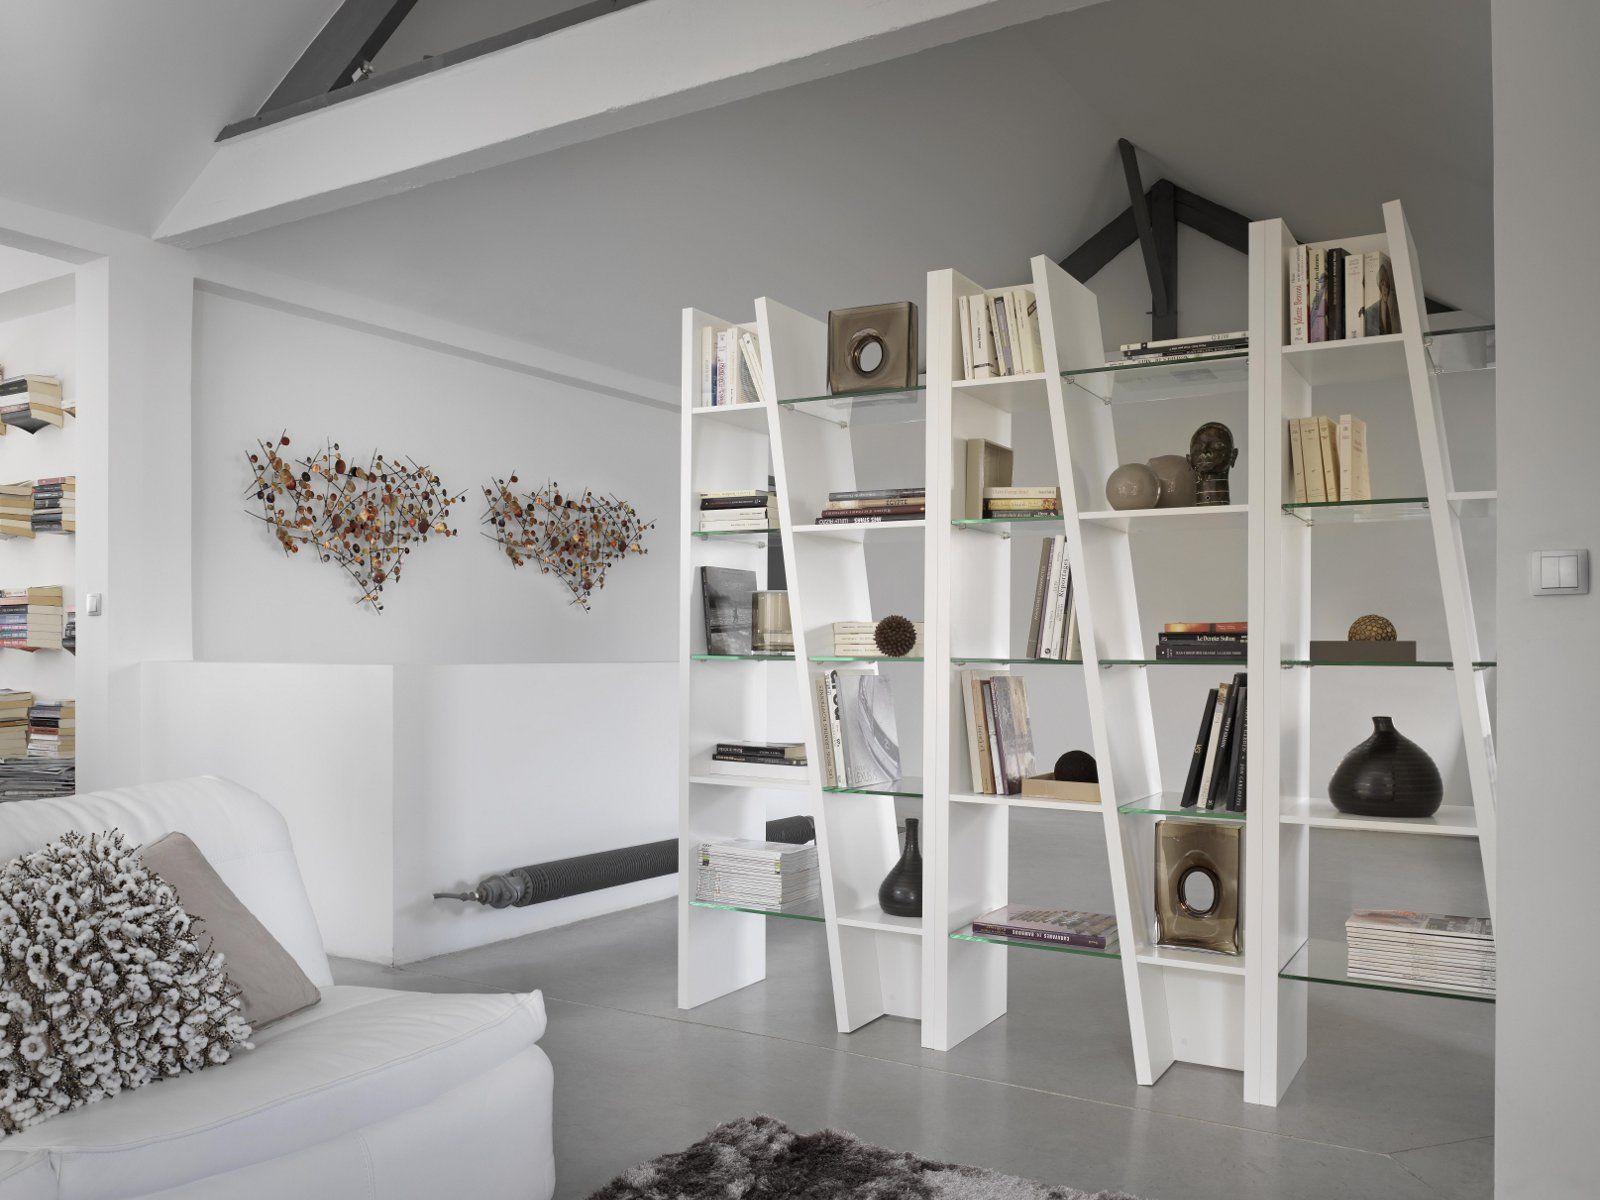 Brem libreria by gautier france - Mobili divisori ambienti ...